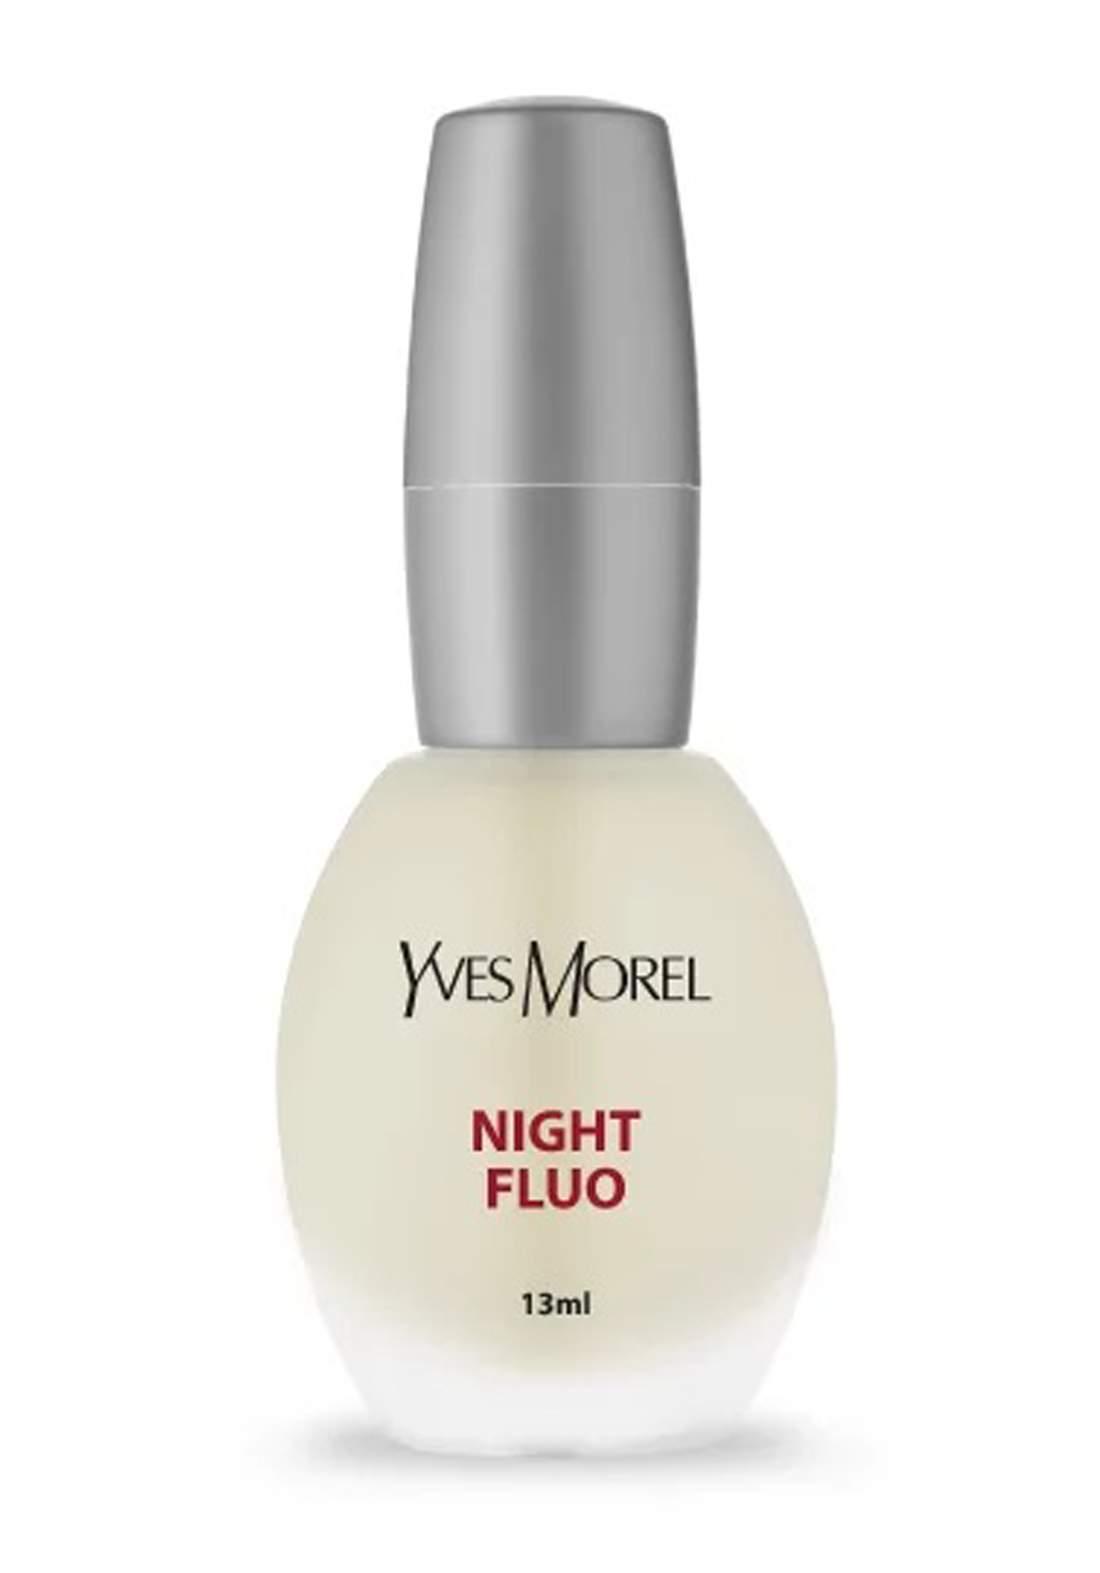 Yves Morel Nail Night Fluo 13ml مجفف طلاء اظافر